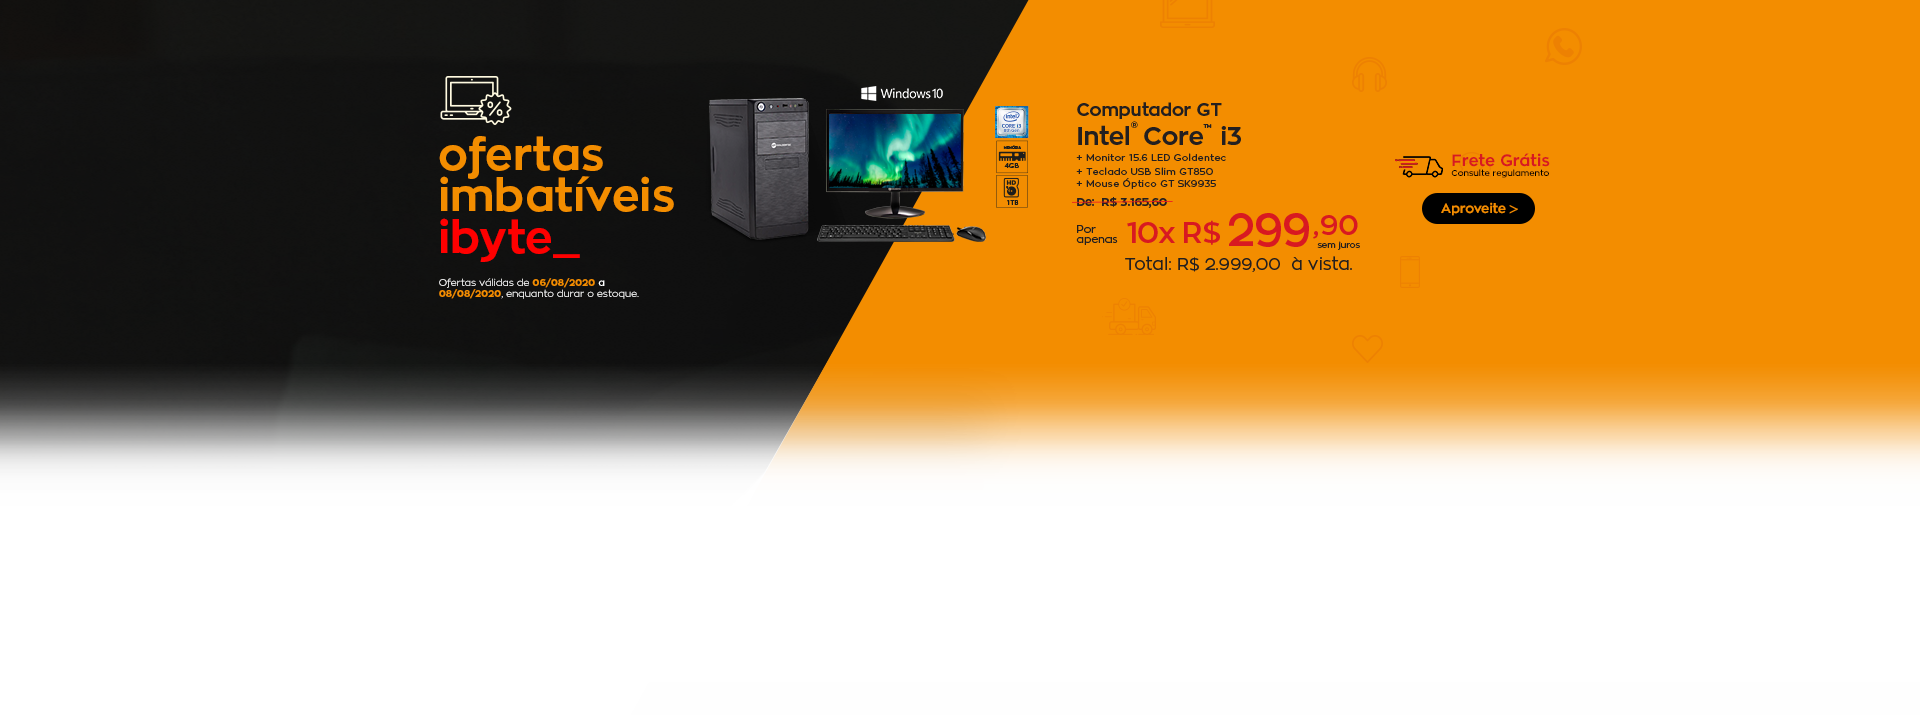 Oferta imbatível - Computador